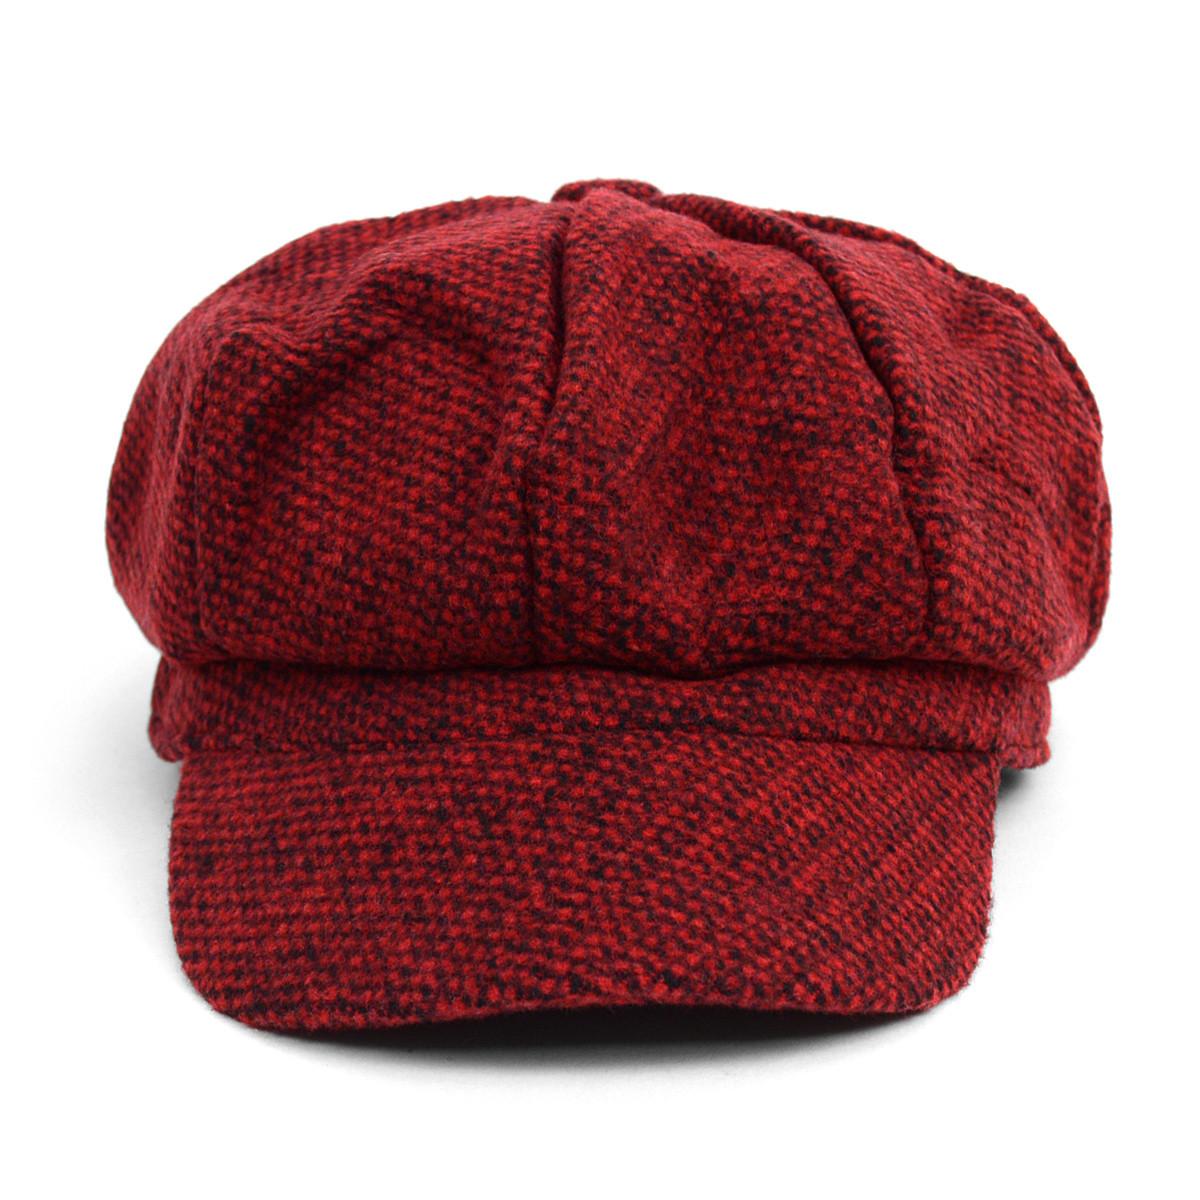 Fall/Winter Unisex British Newsboy Beret Style Cap - WNH1761-65-66